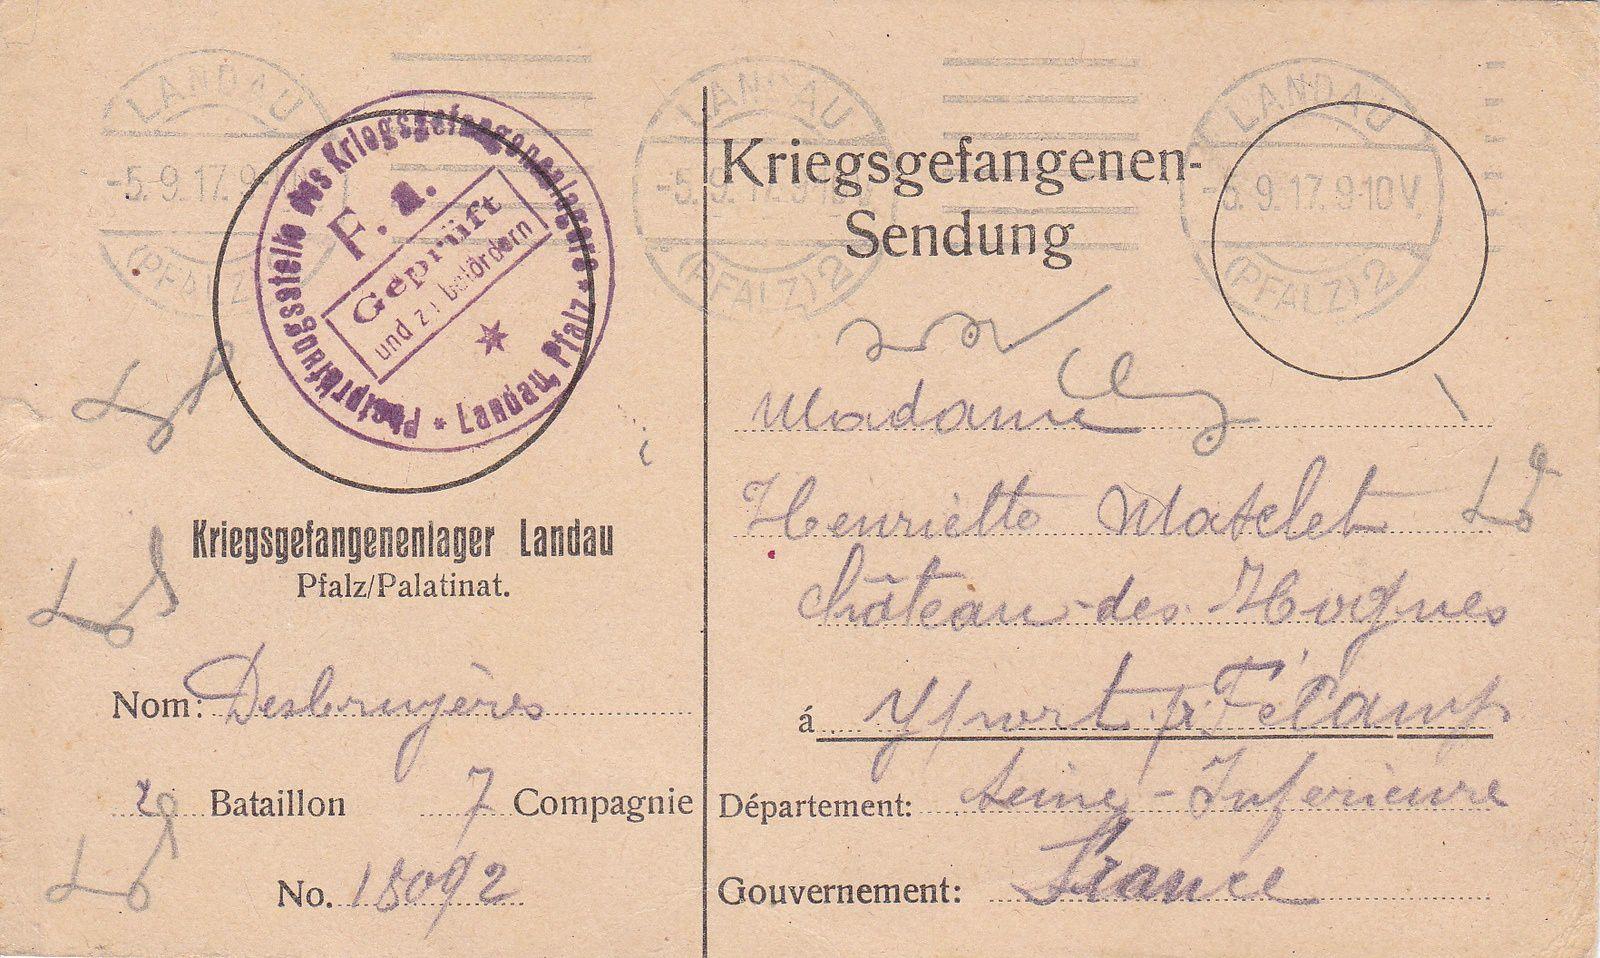 Correspondance du 5 septembre 1917.